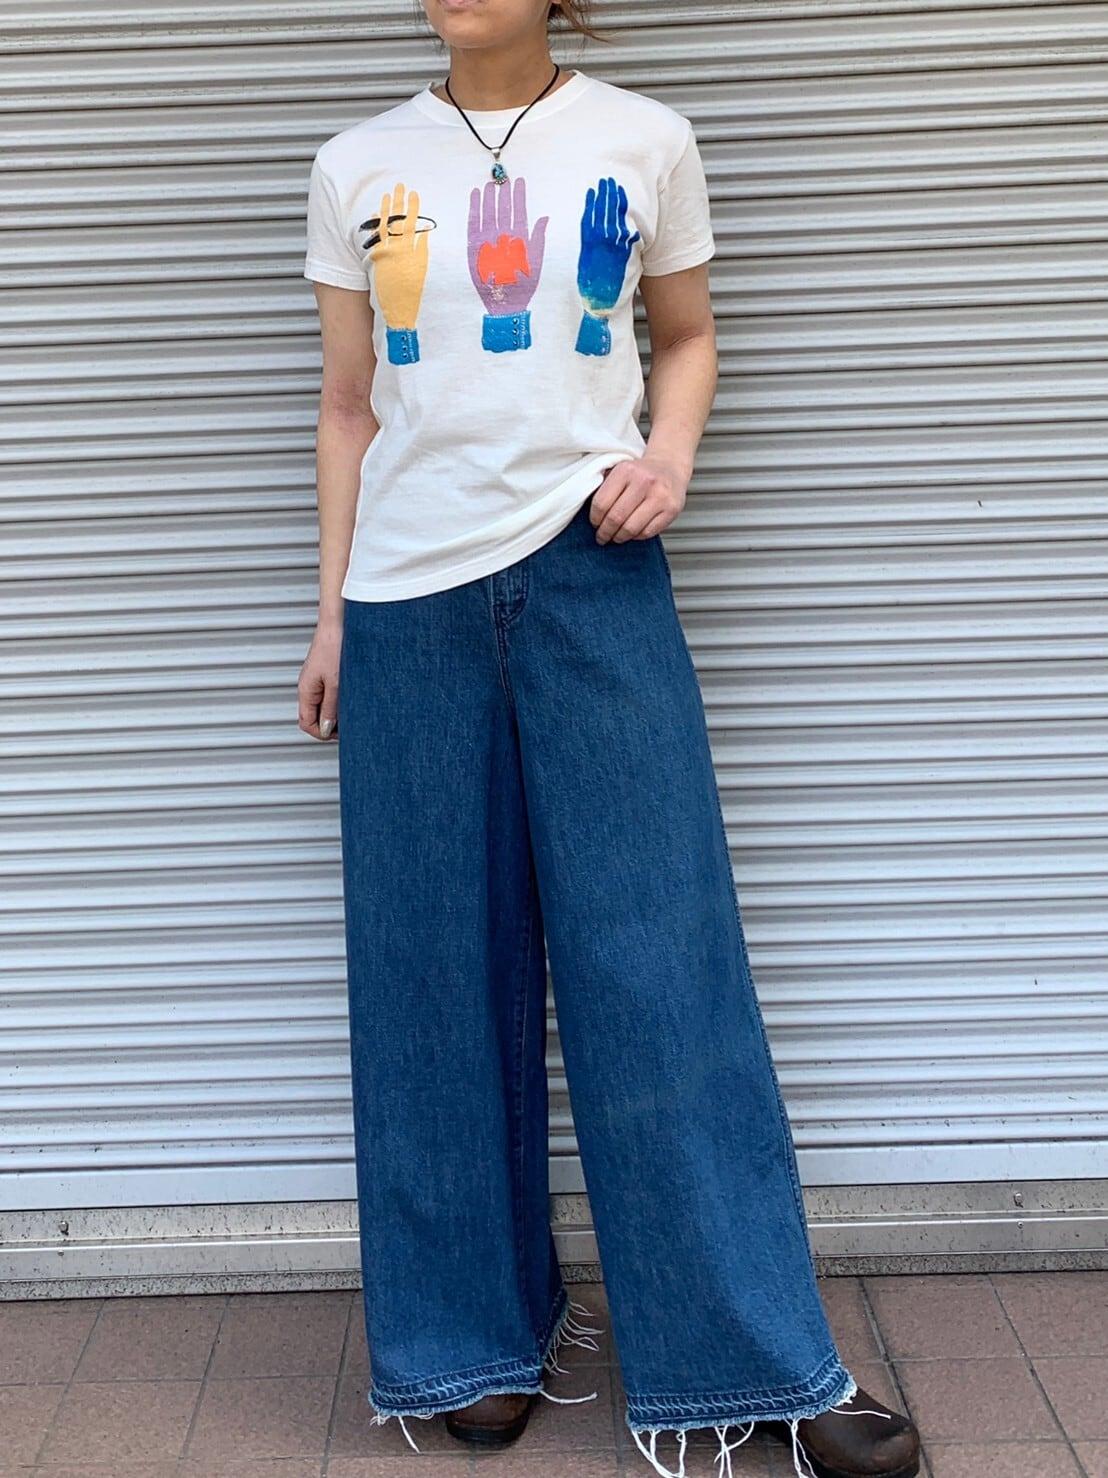 【KAPITAL】11.5ozデニム フリンジコーンパンツ